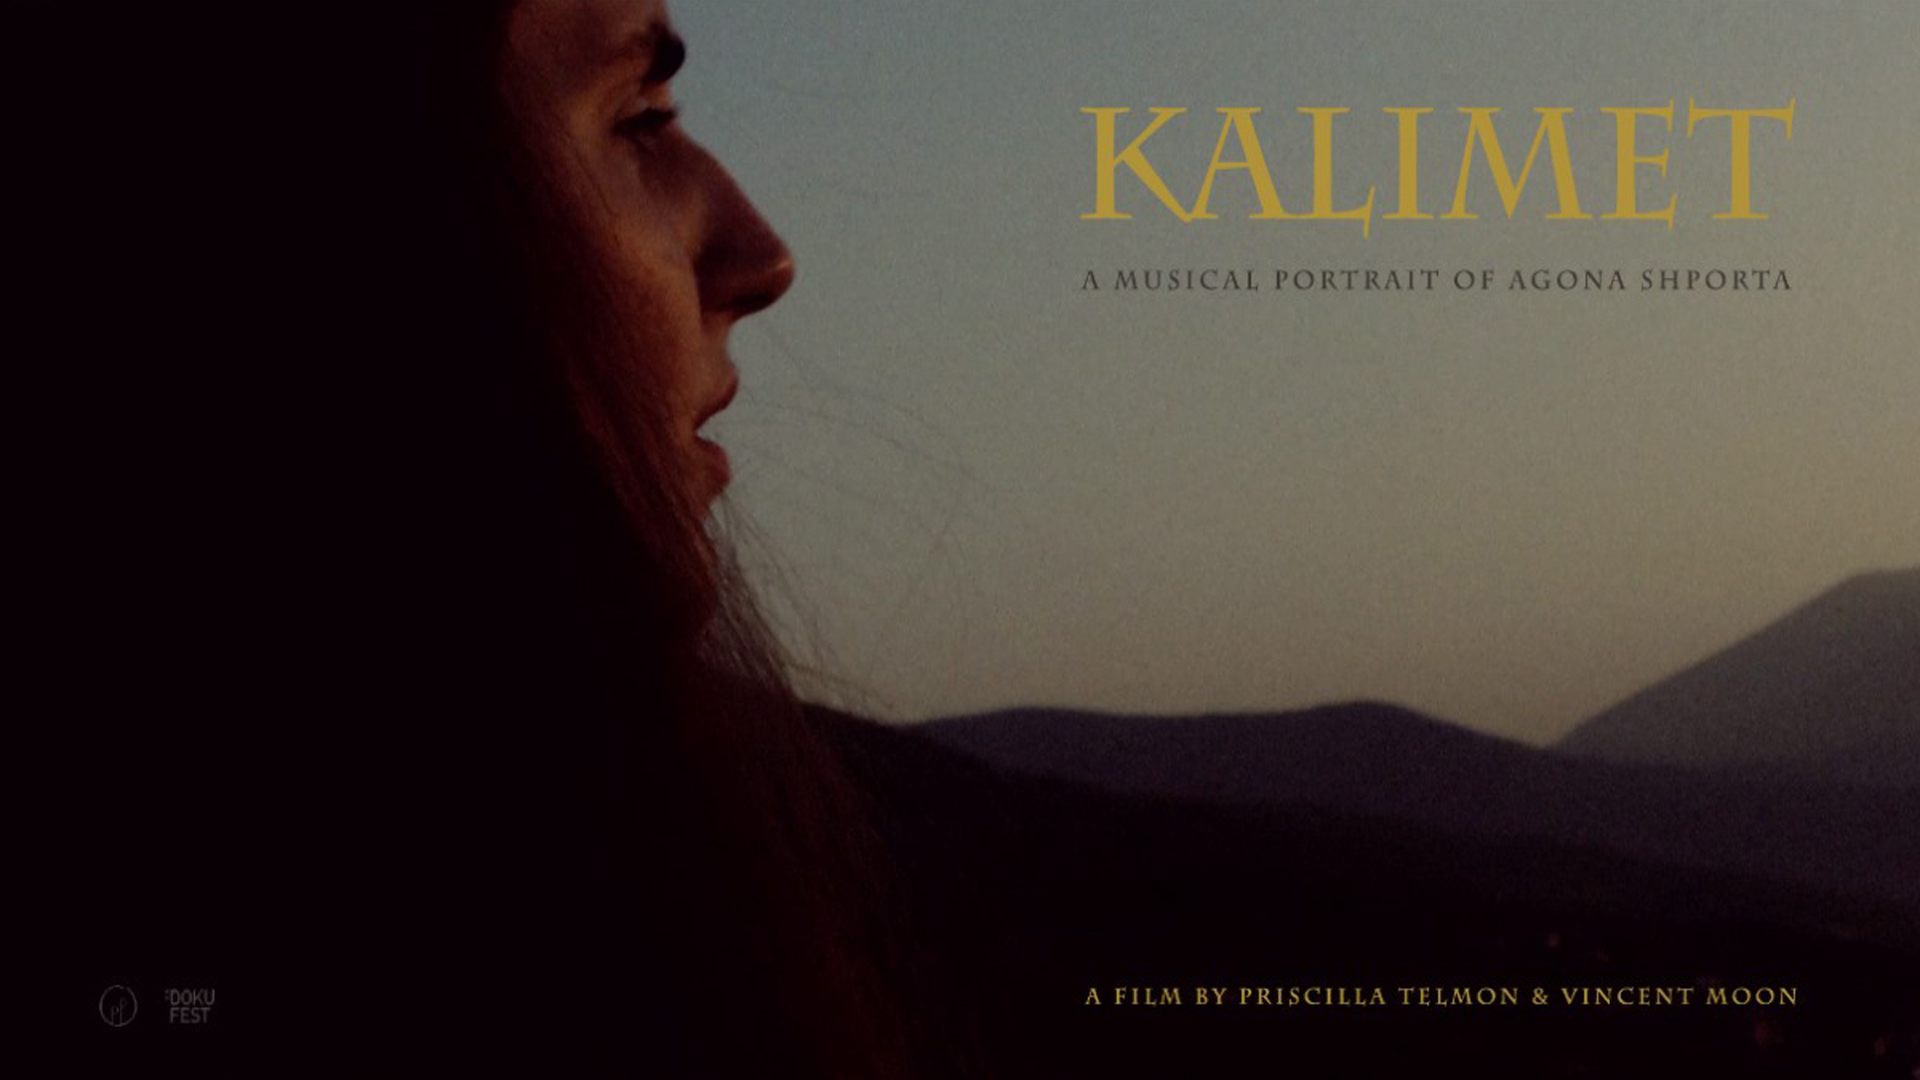 KALIMET: A MUSICAL PORTRAIT OF AGONA SHPORTA